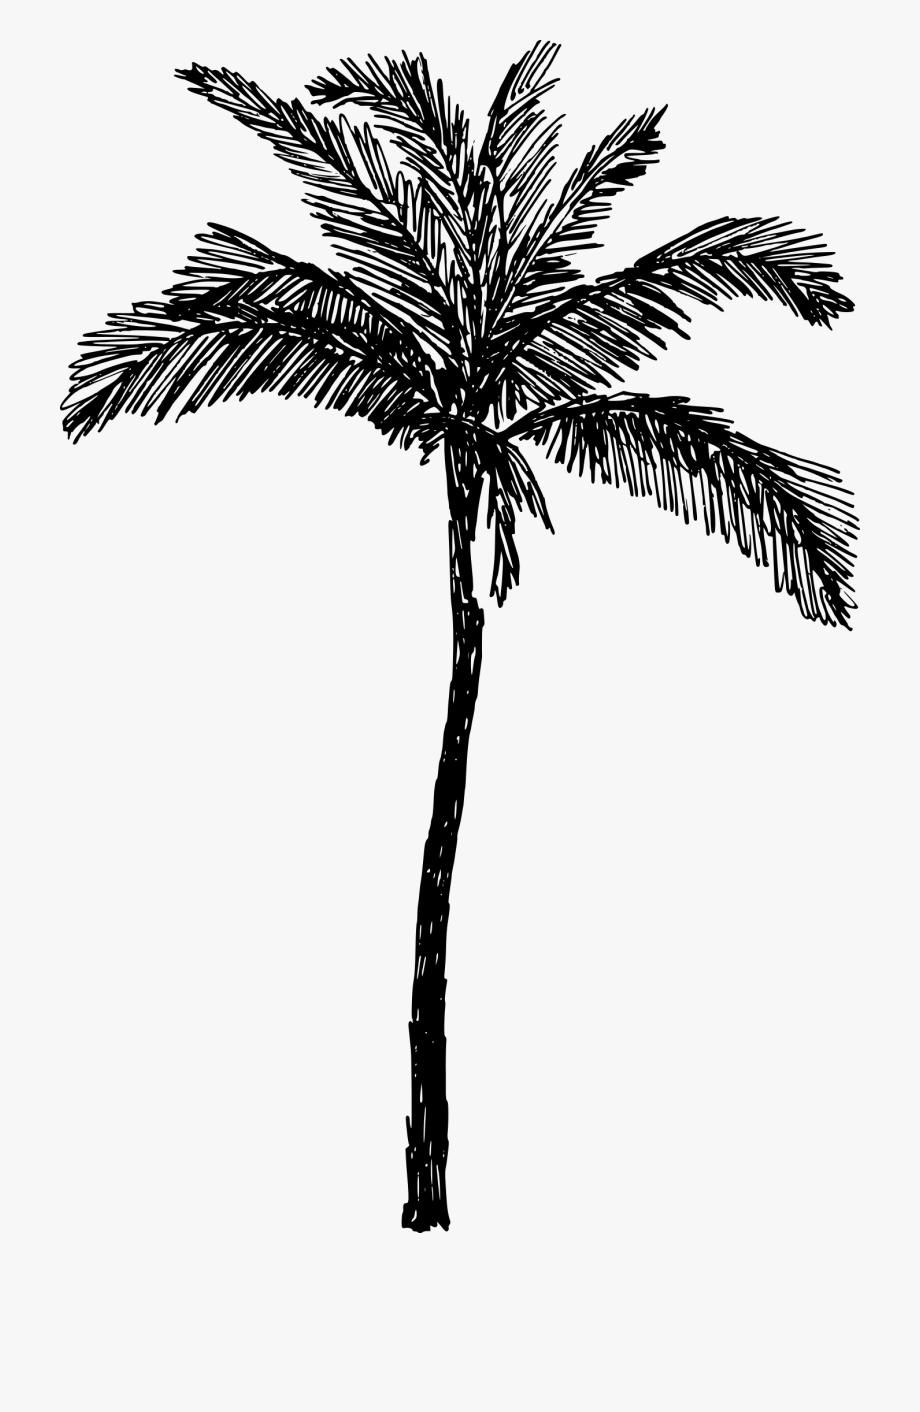 Palm tree drawing clipart jpg transparent library Palm Trees Drawing Clip Art Line Art Coconut - Palm Tree Png ... jpg transparent library